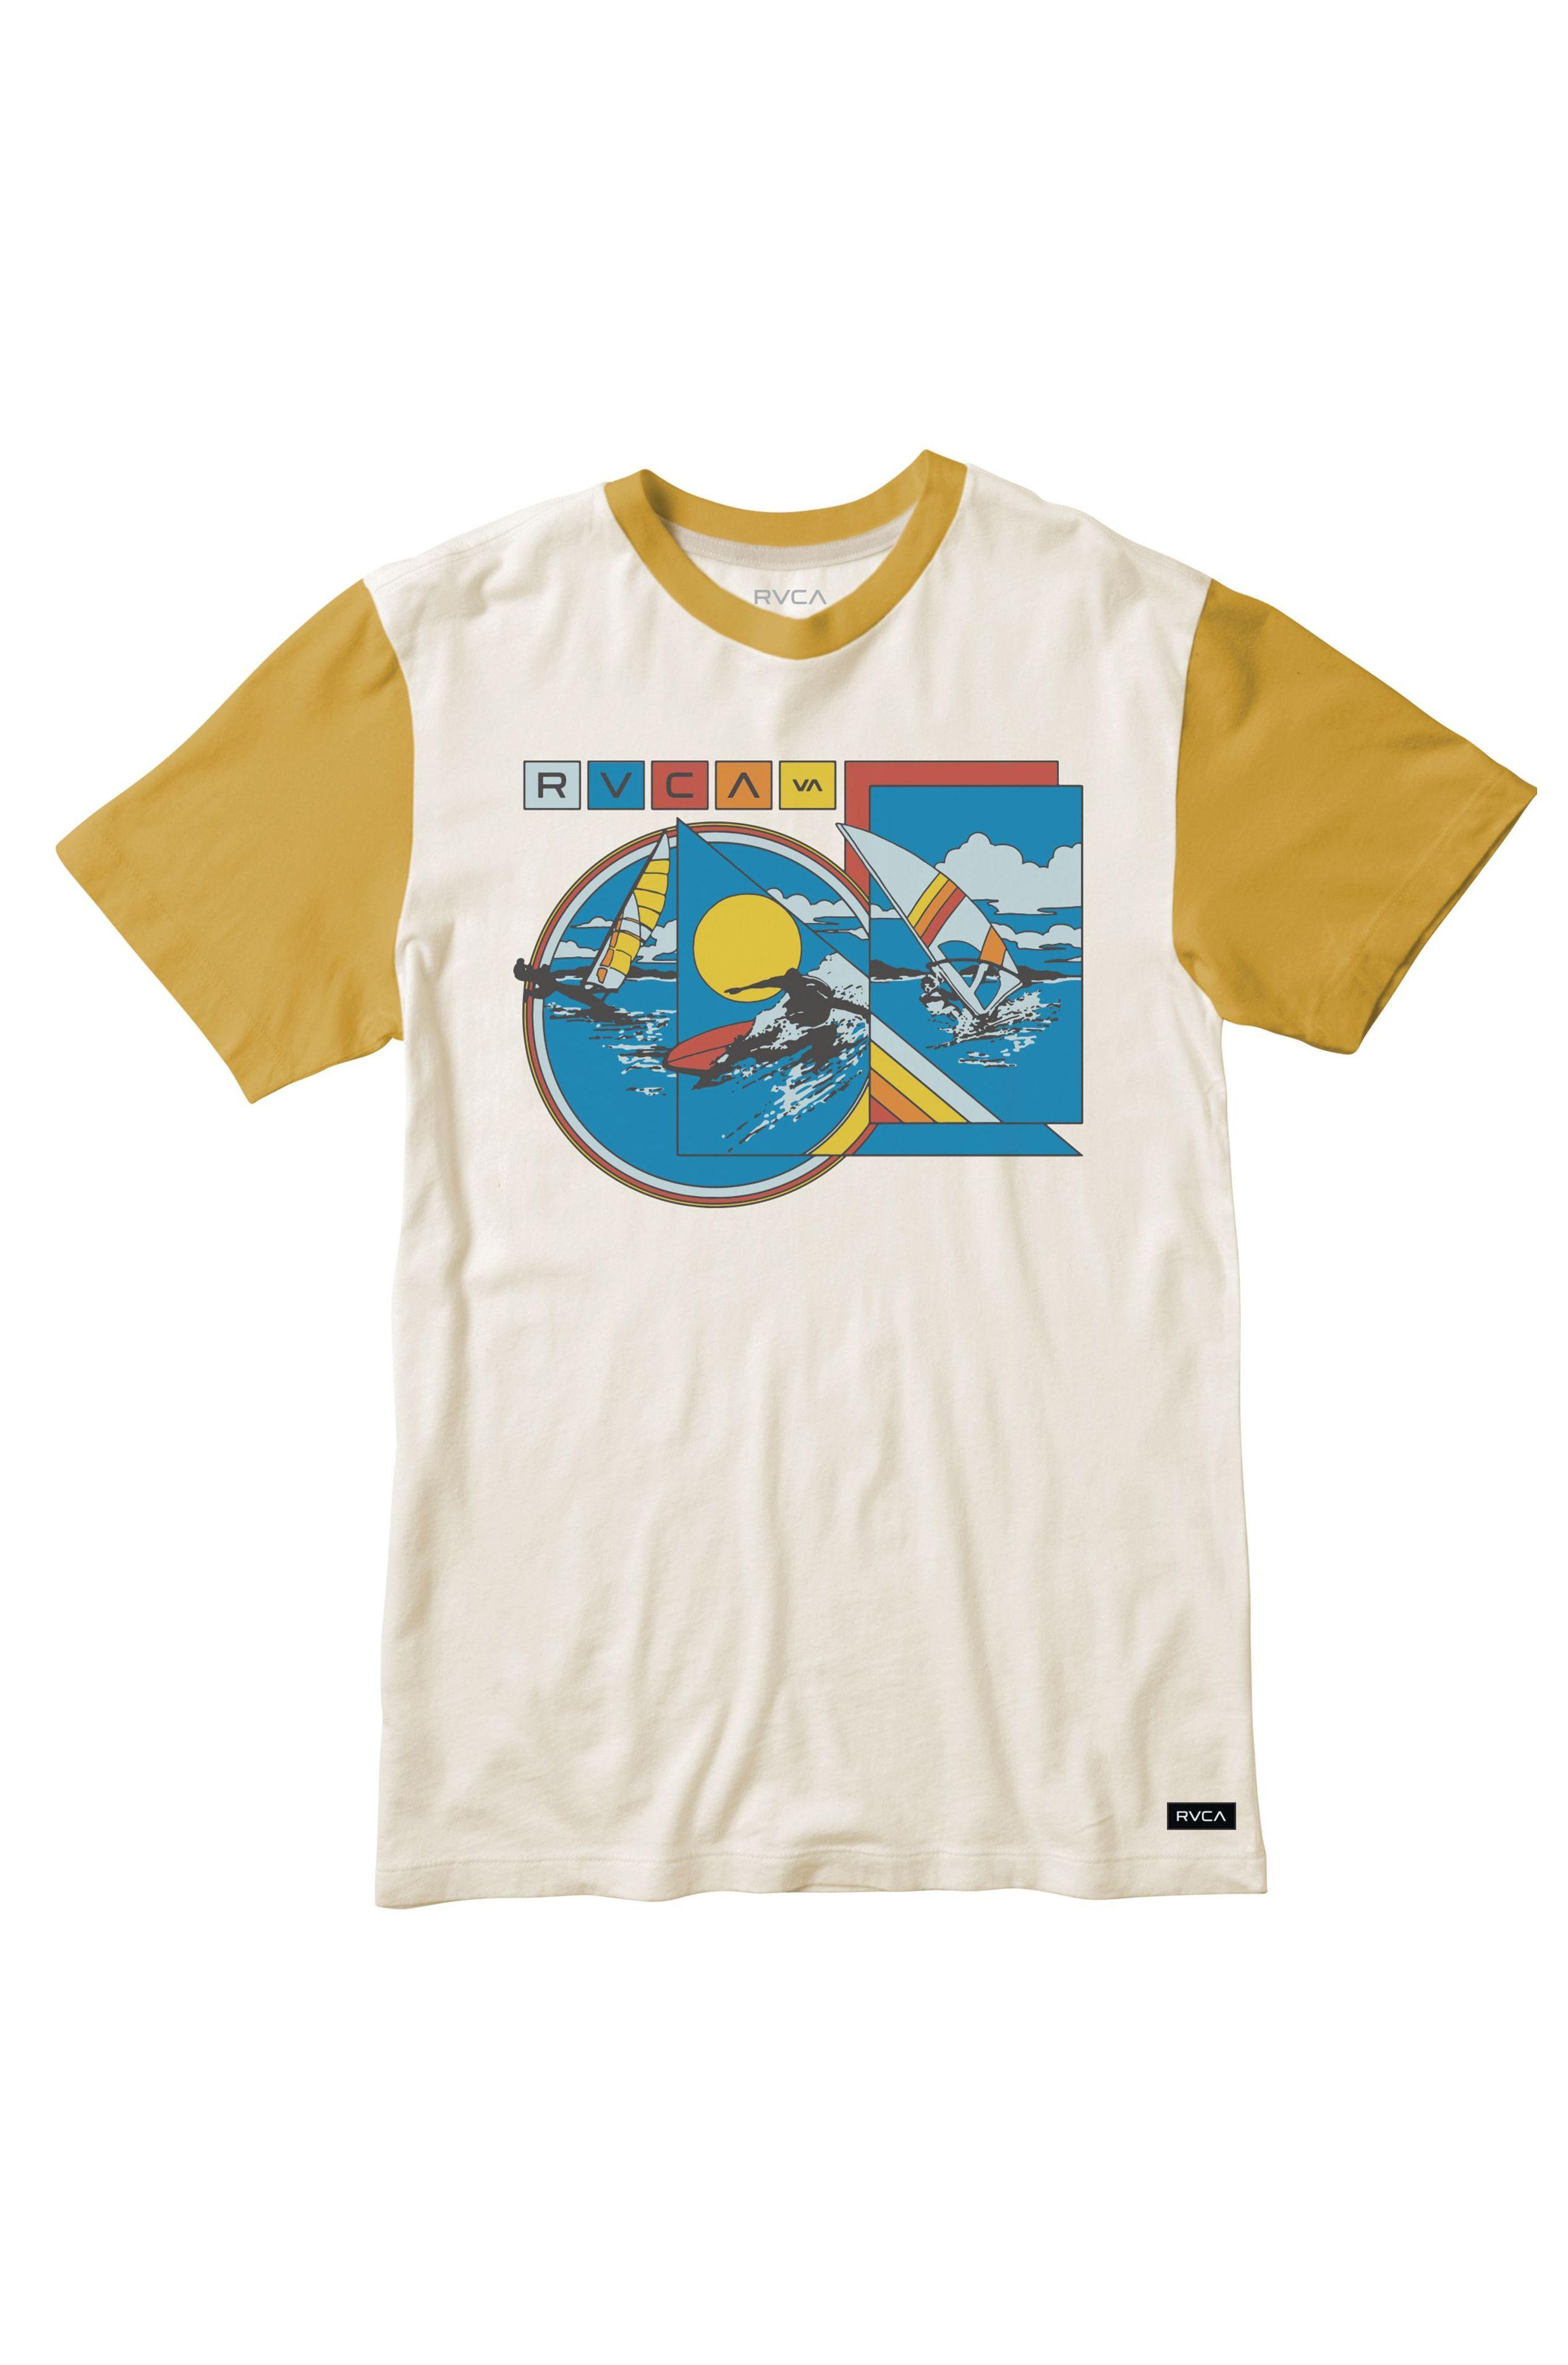 RVCA T-Shirt EVAN MOCK TOURIST BL EVAN MOCK Antique White